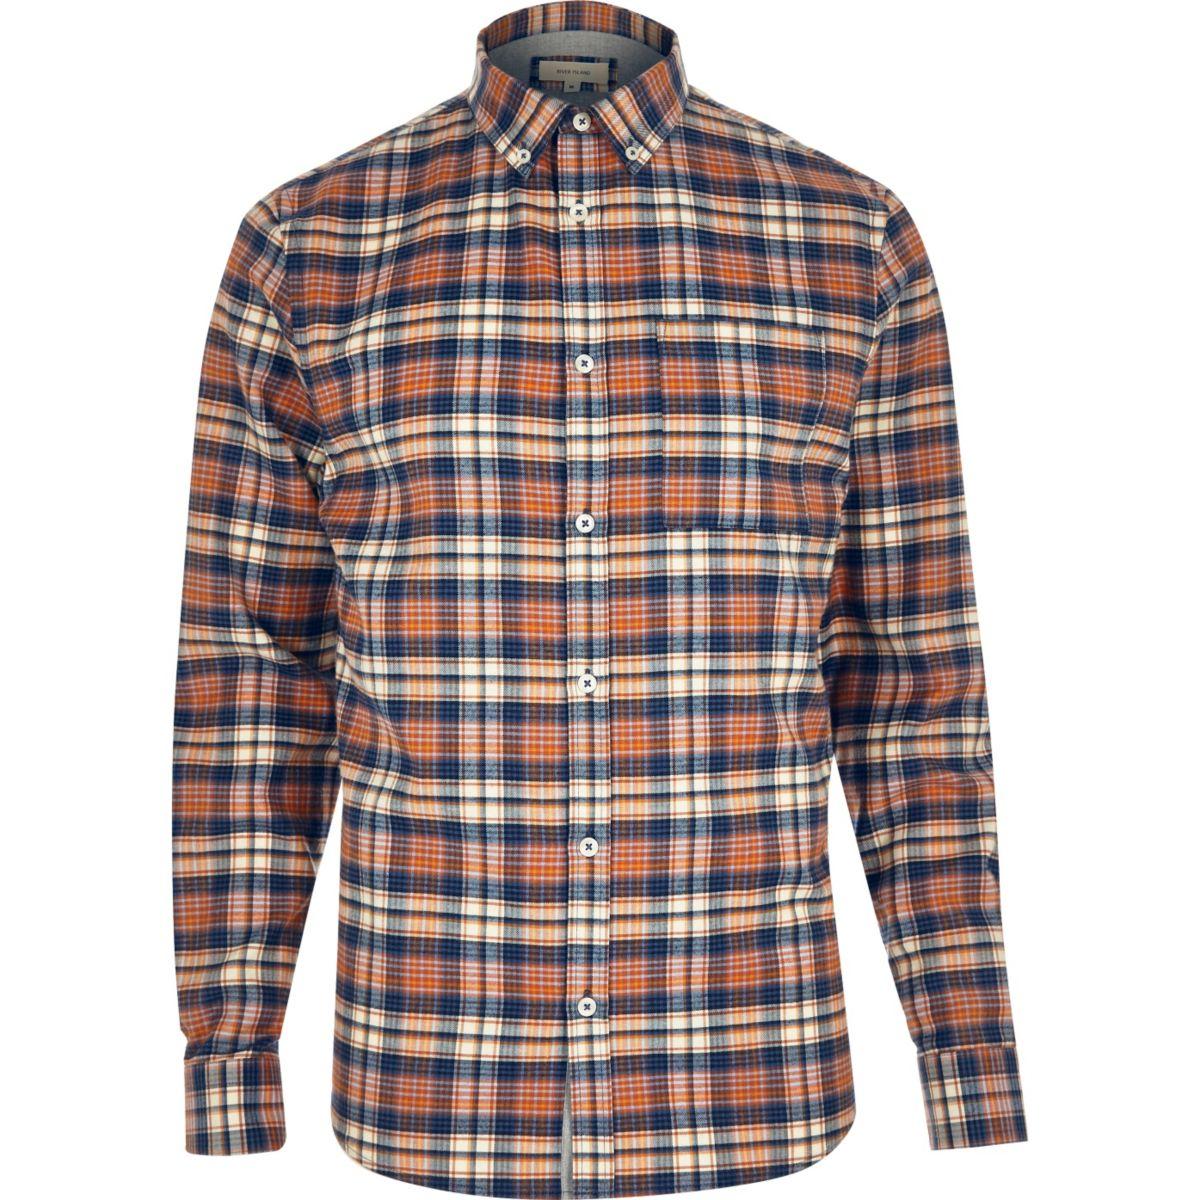 Orange check flannel shirt